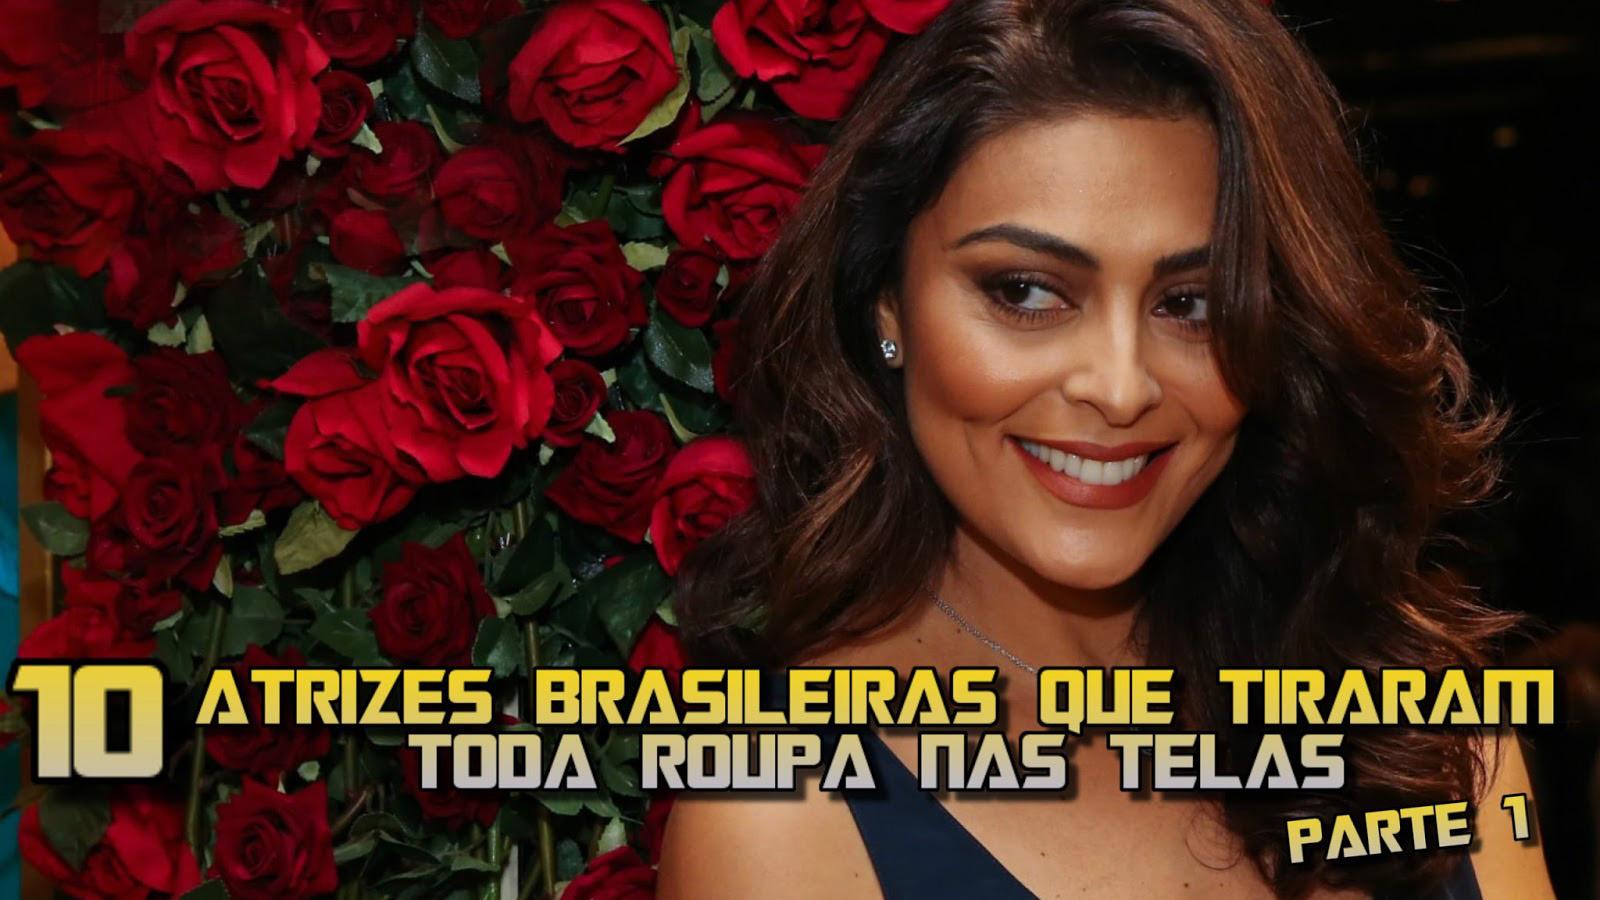 10 ATRIZES BRASILEIRAS QUE TIRARAM TODA ROUPA NAS TELAS